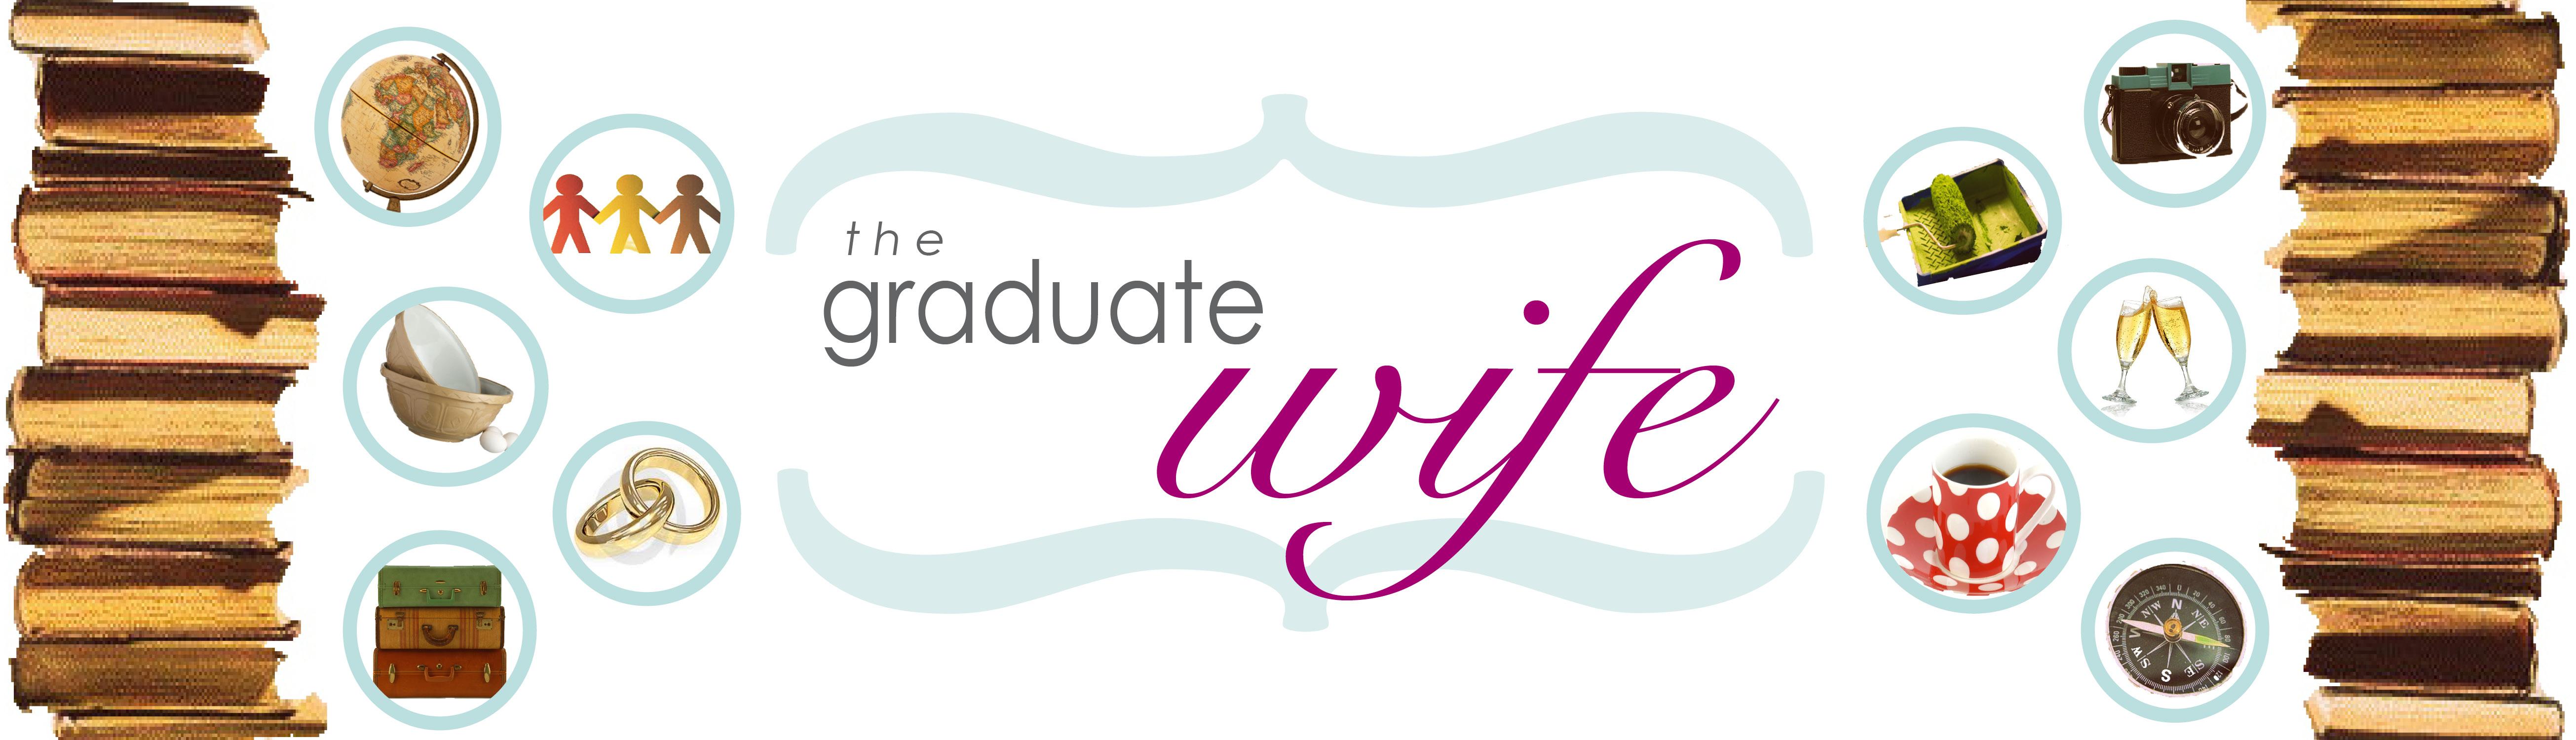 the graduate wife